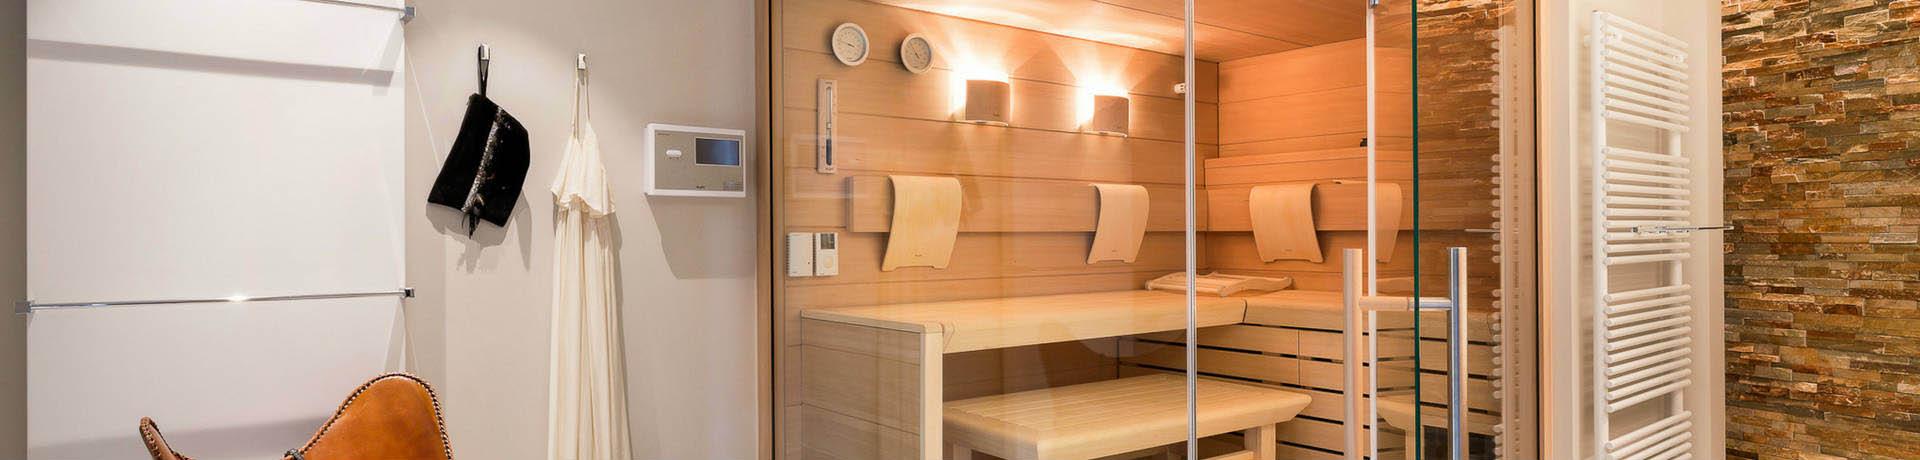 Construire Un Sauna Finlandais d'un sauna klafs sur mesure au un sauna design de klafs